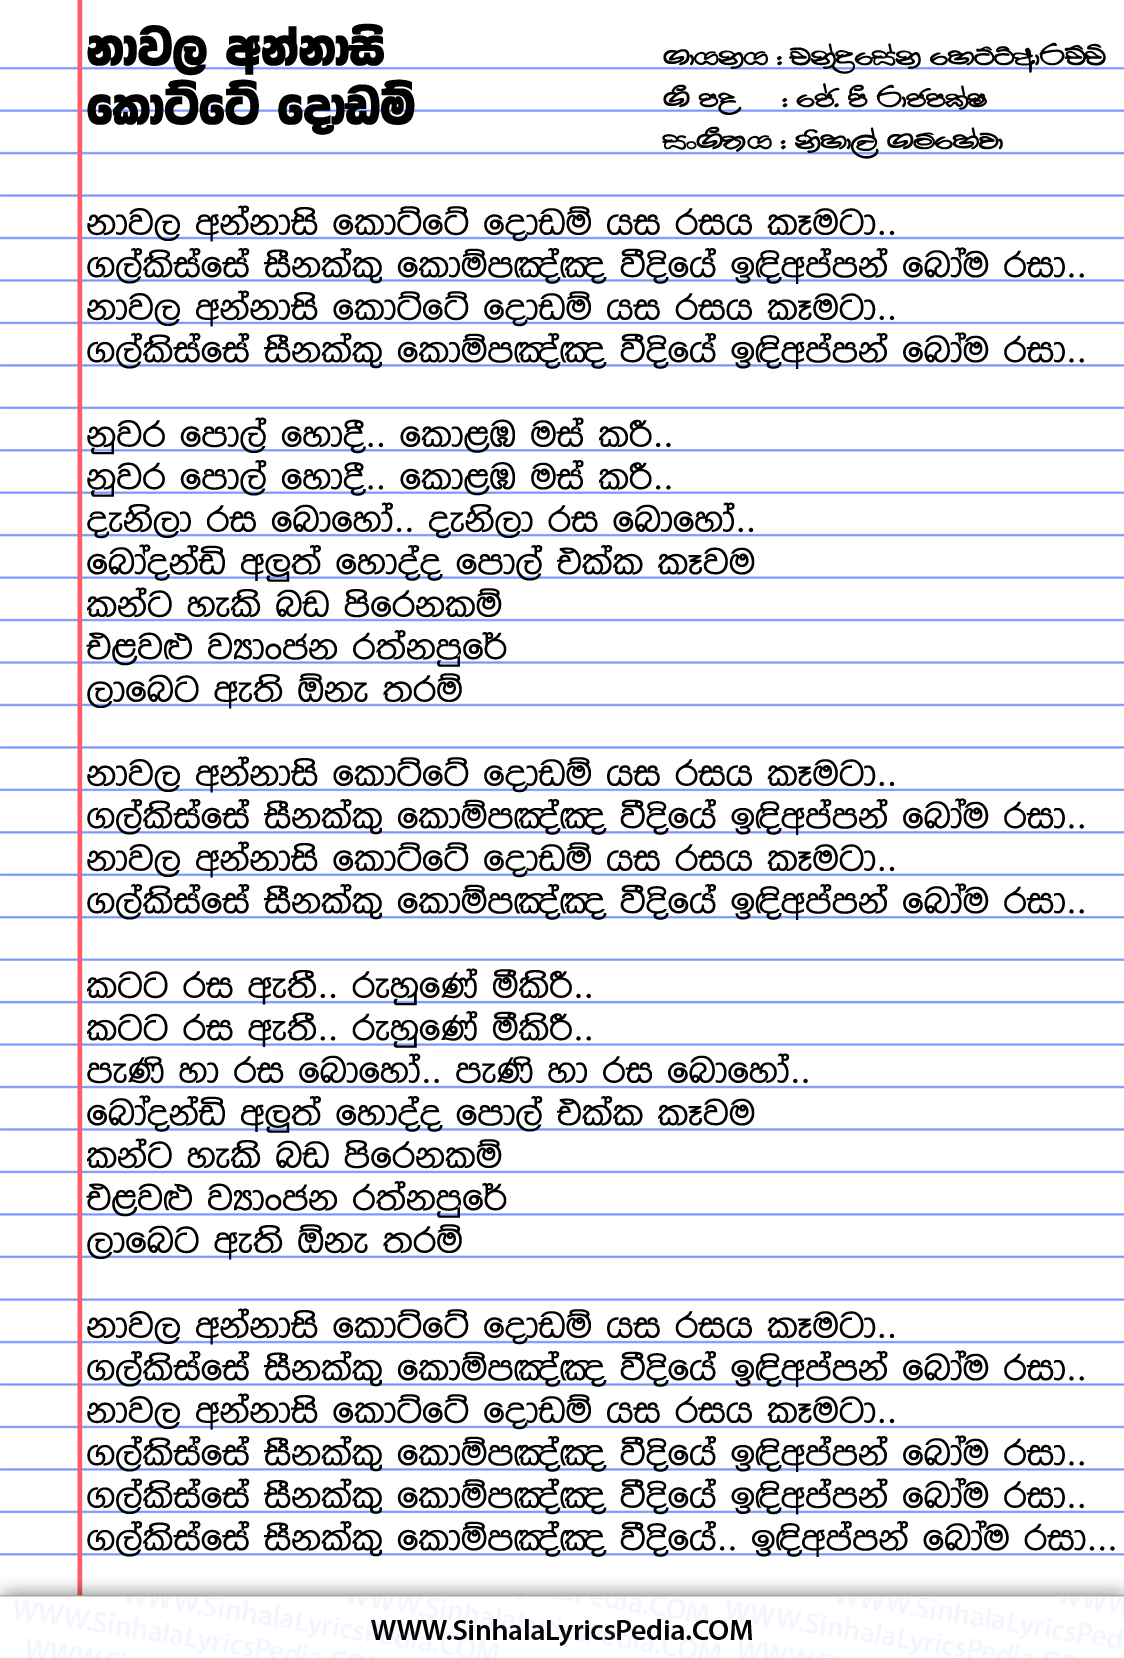 Nawala Annasi Kotte Dodam Song Lyrics